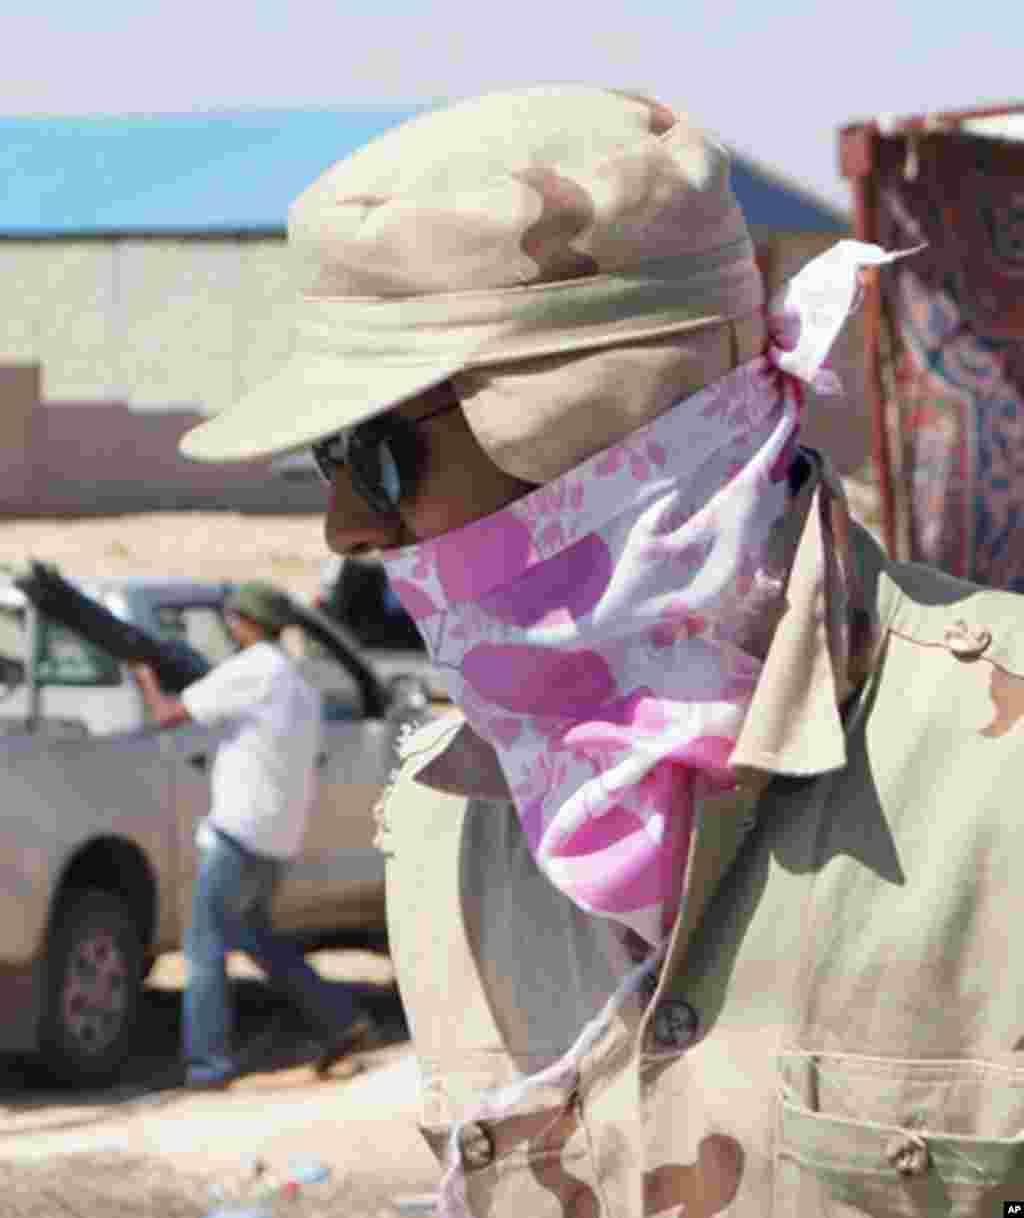 The NTC has yet to issue regular uniforms, Bani Walid, Libya, 11 September 2011. - E. Arrott